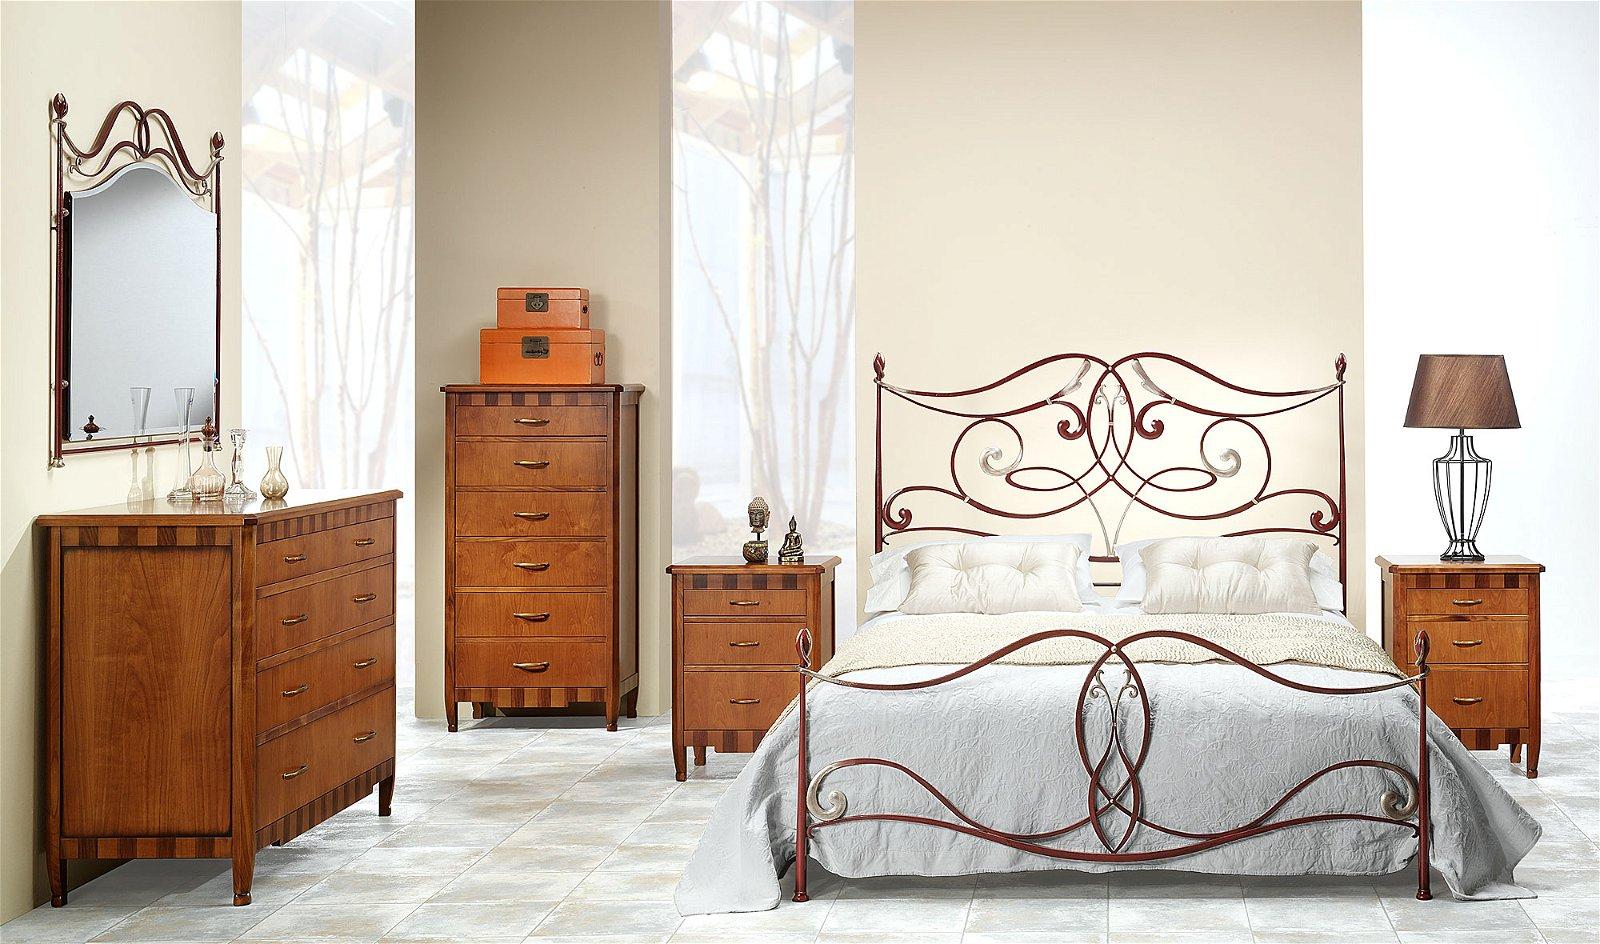 Dormitorio forja Iria